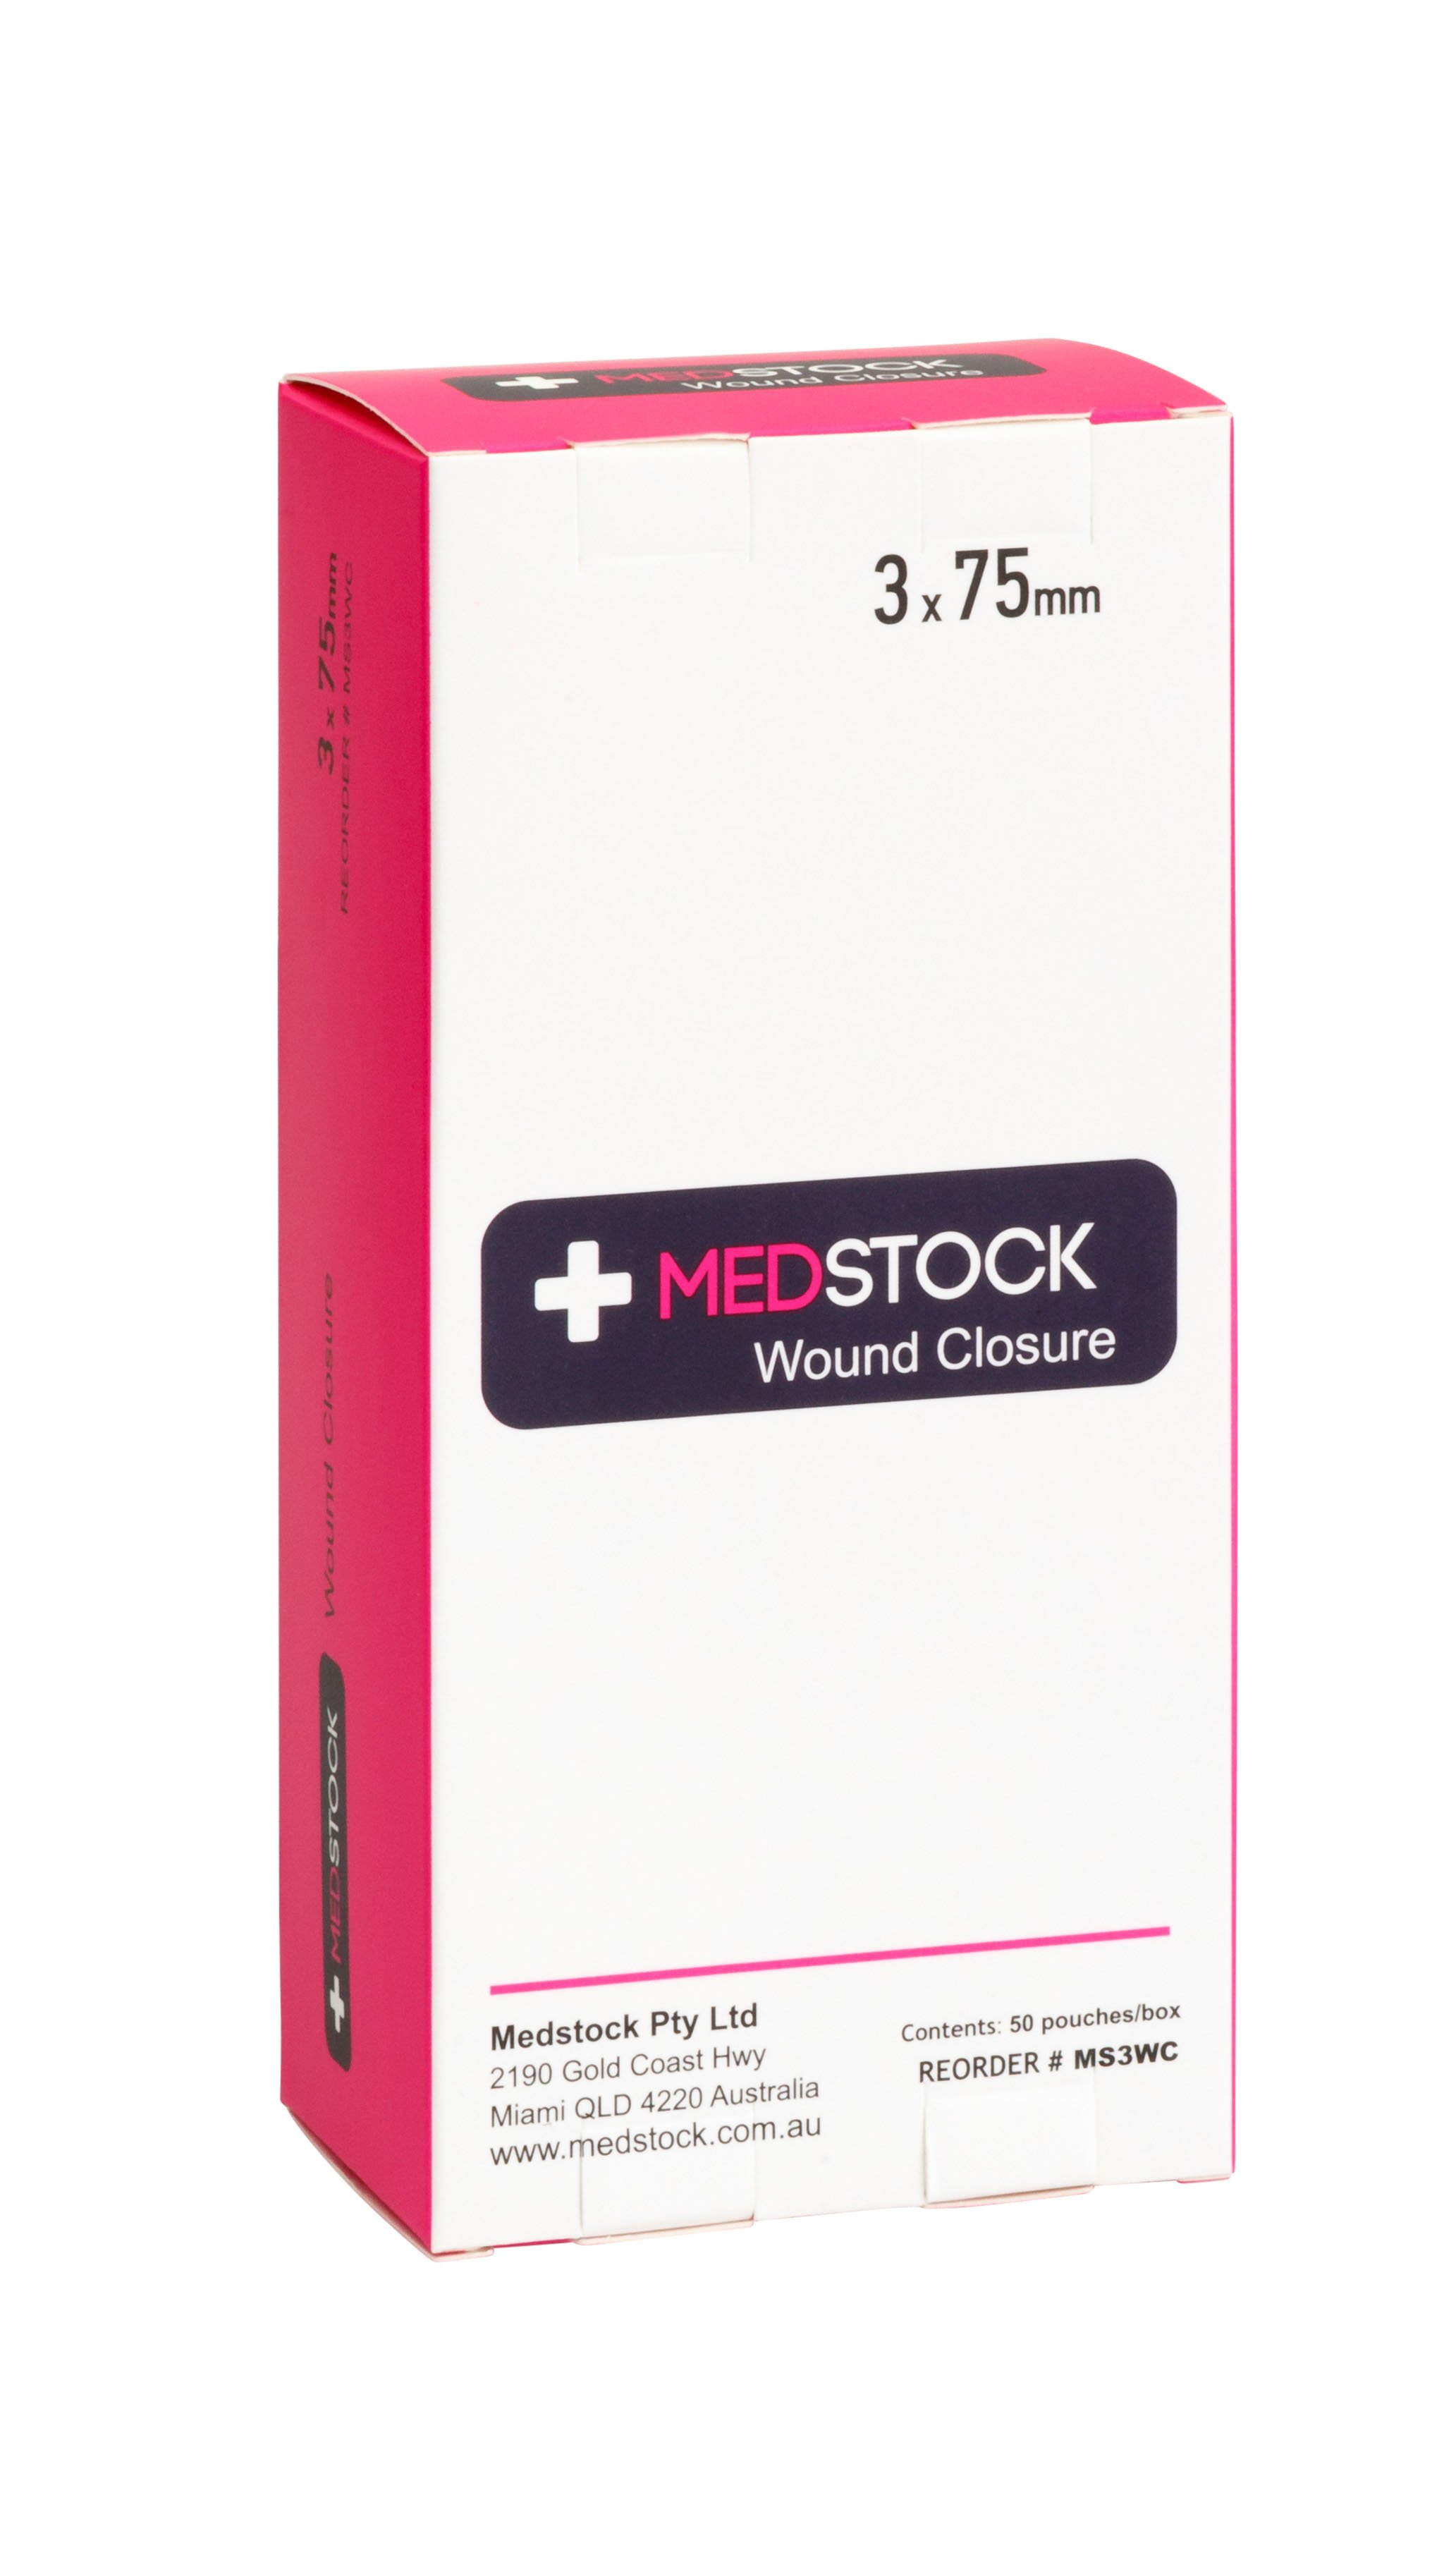 MEDSTOCK WOUND CLOSURE STRIP 3MMx75MM, BOX 50